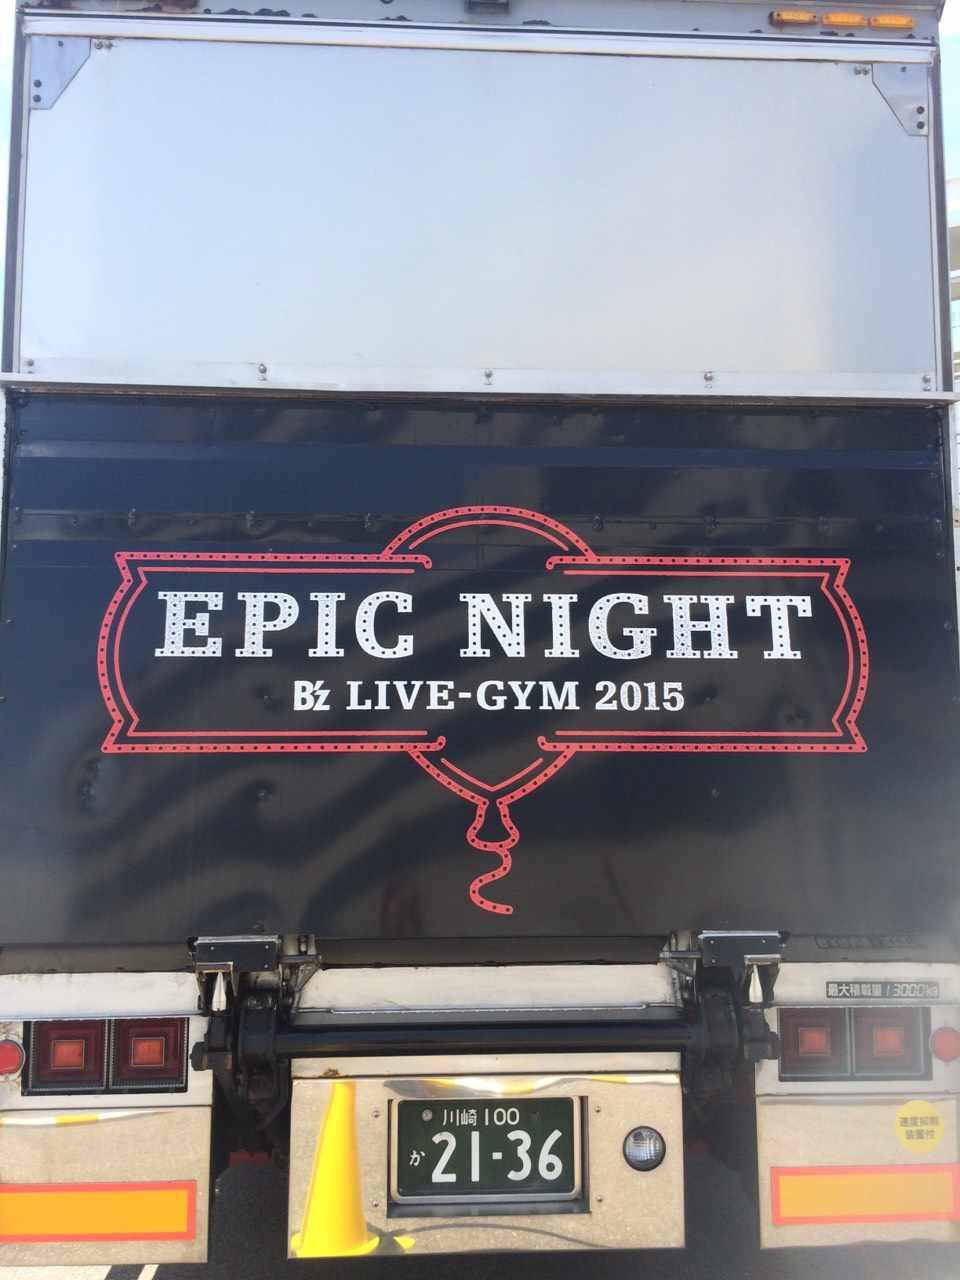 B'z LIVE-GYM 2015 -EPIC NIGHT-のファイナル公演情報まとめ!!写真もみれます!